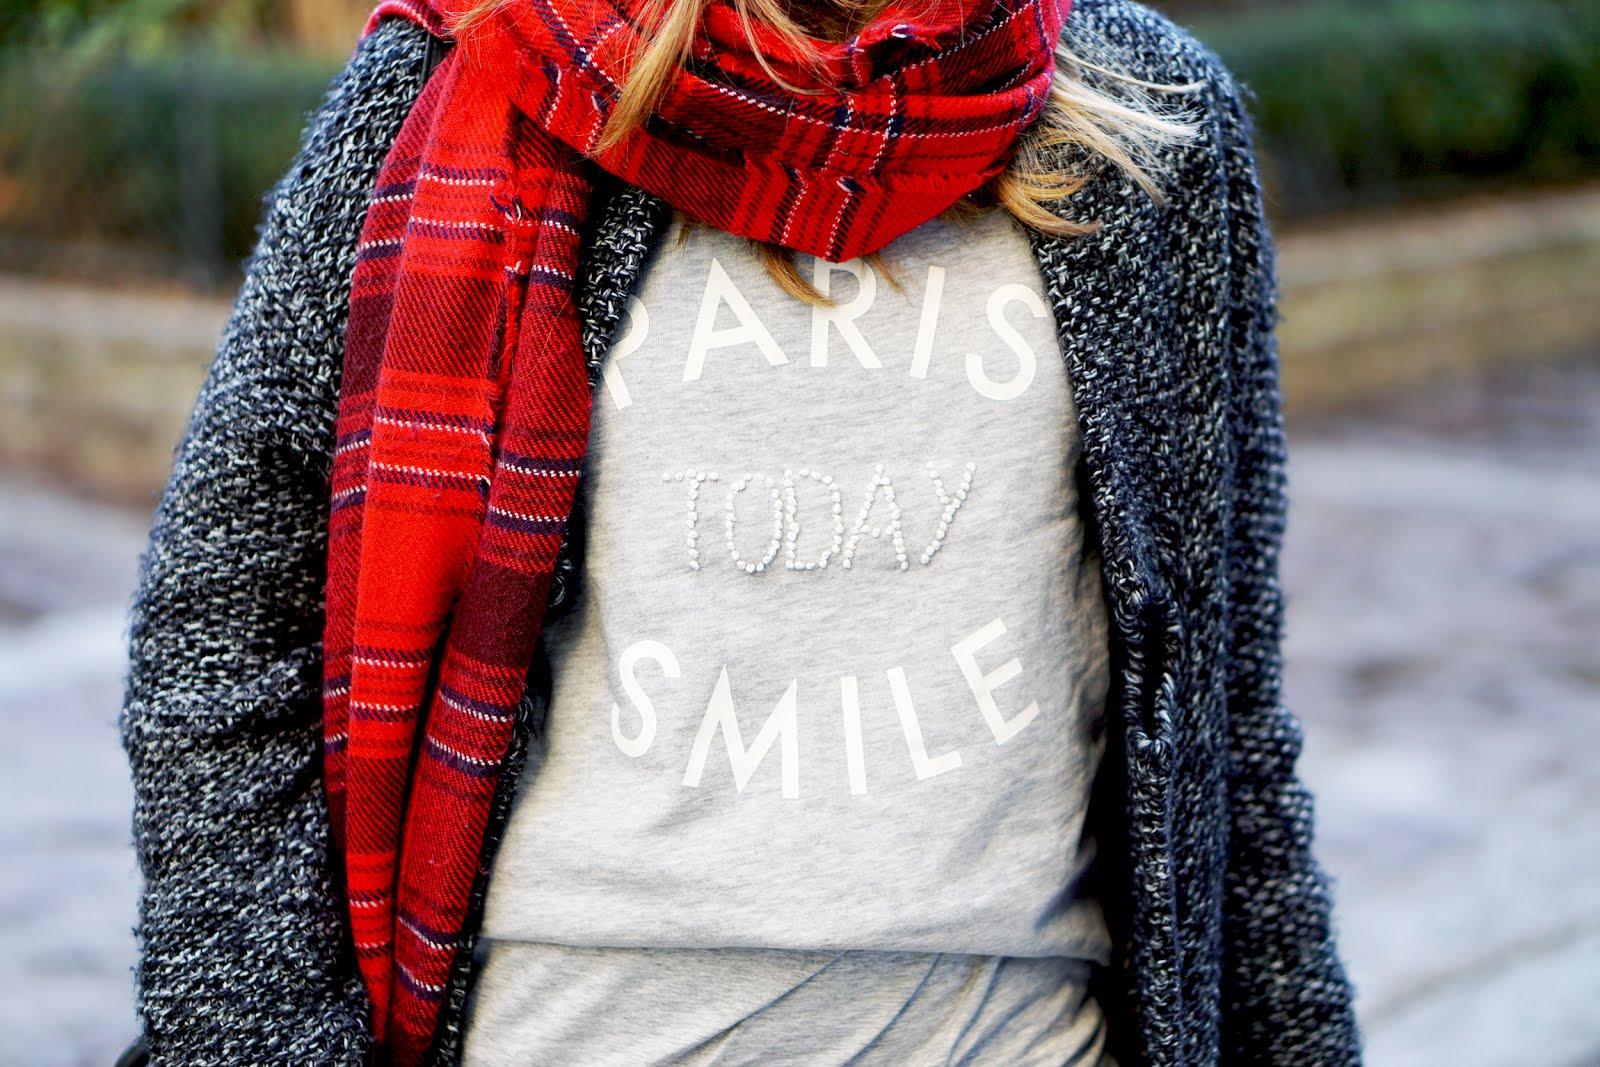 paris today smile